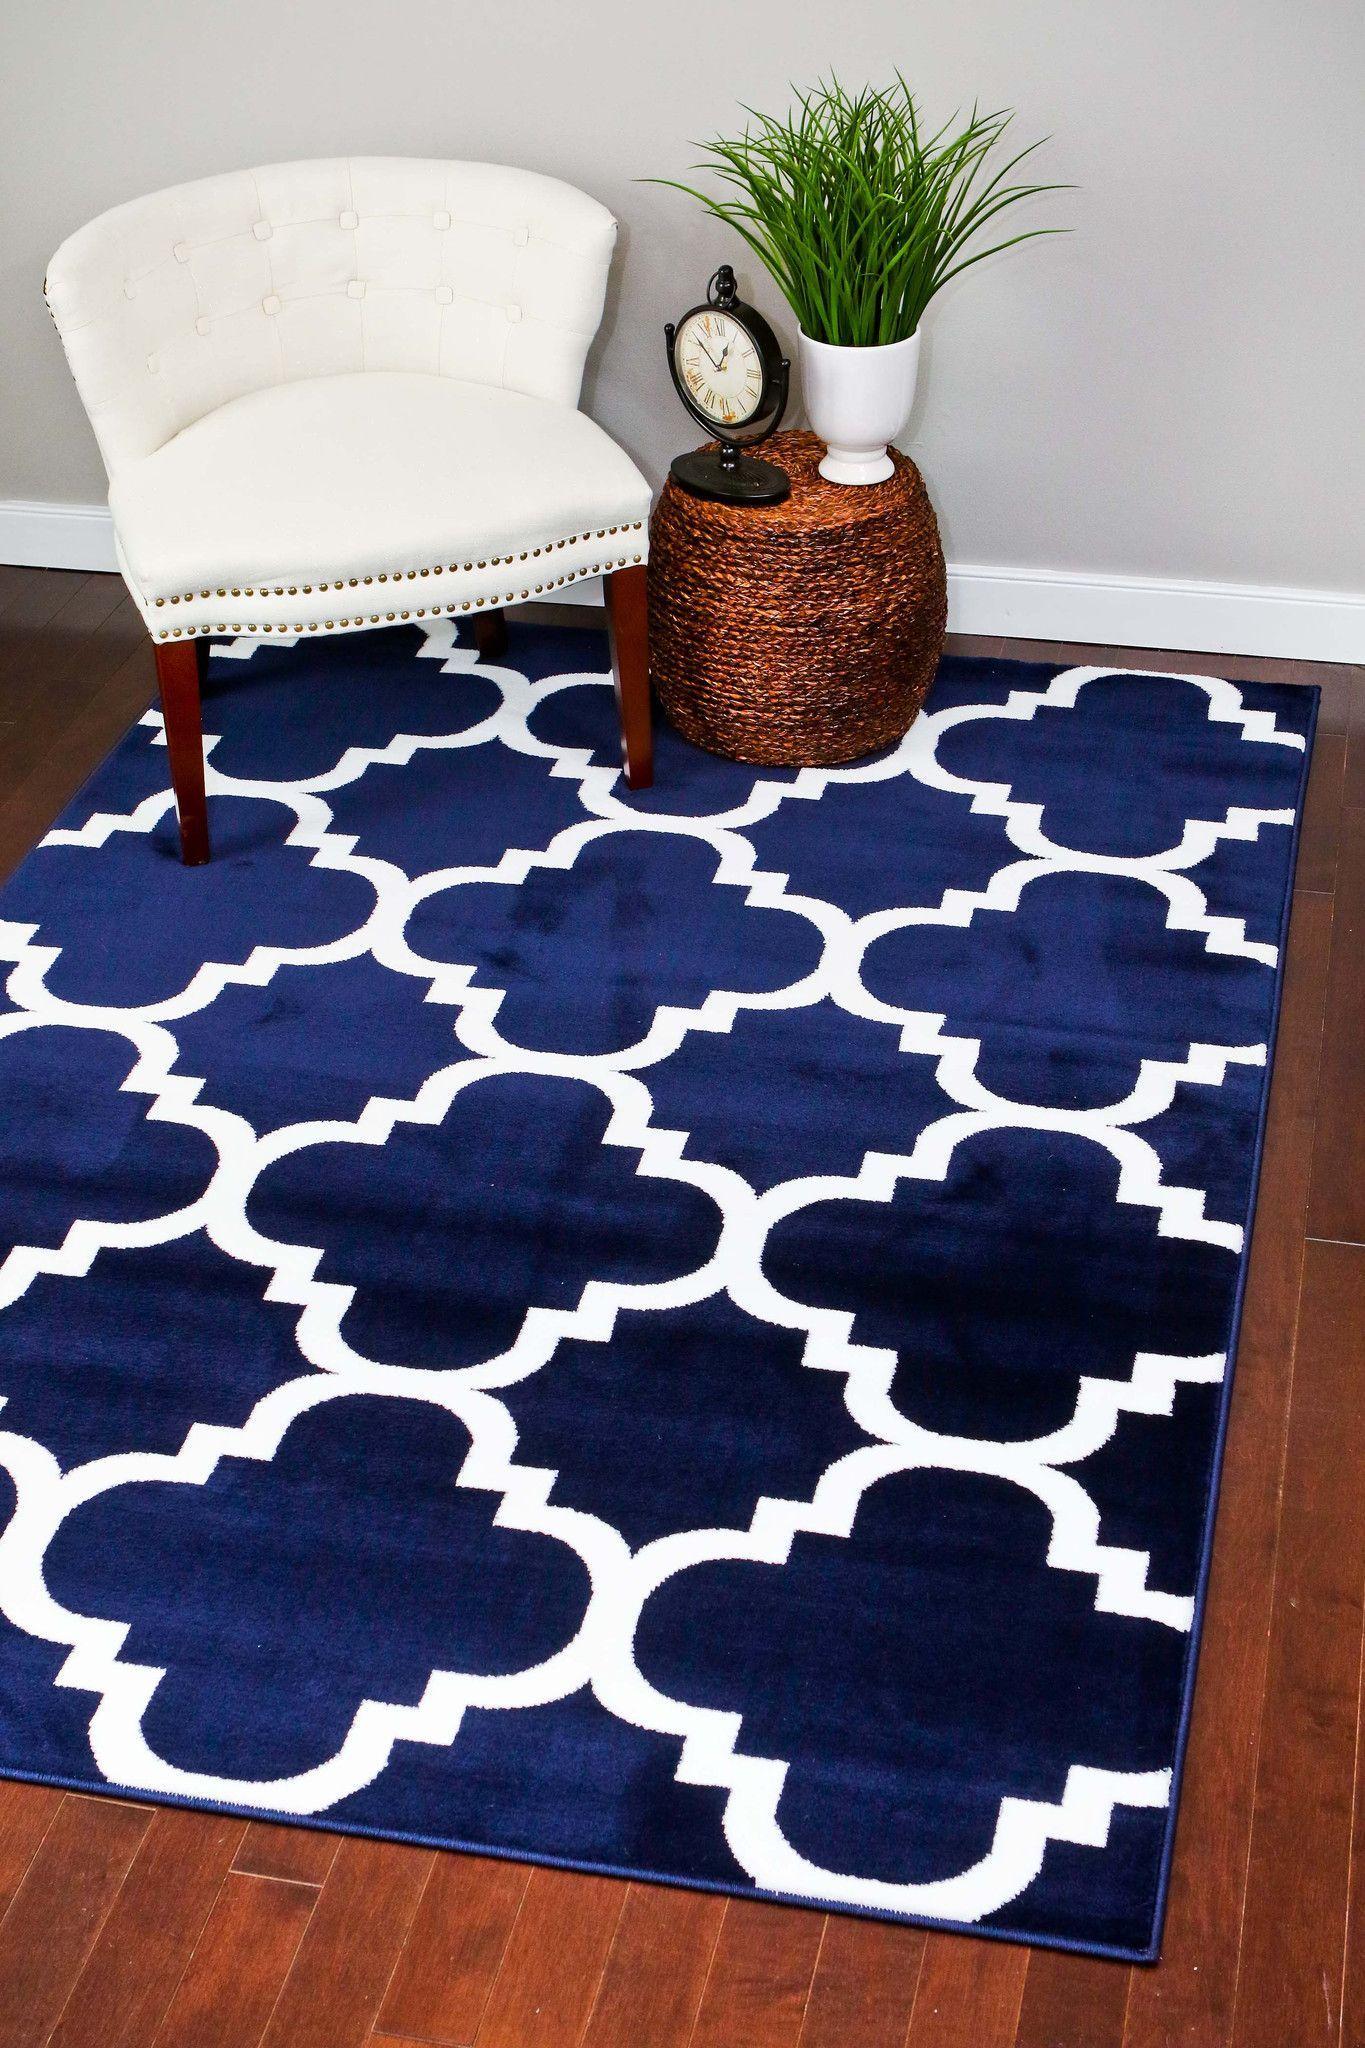 ^ 1000+ ideas about ontemporary rea ugs on Pinterest rea rugs ...